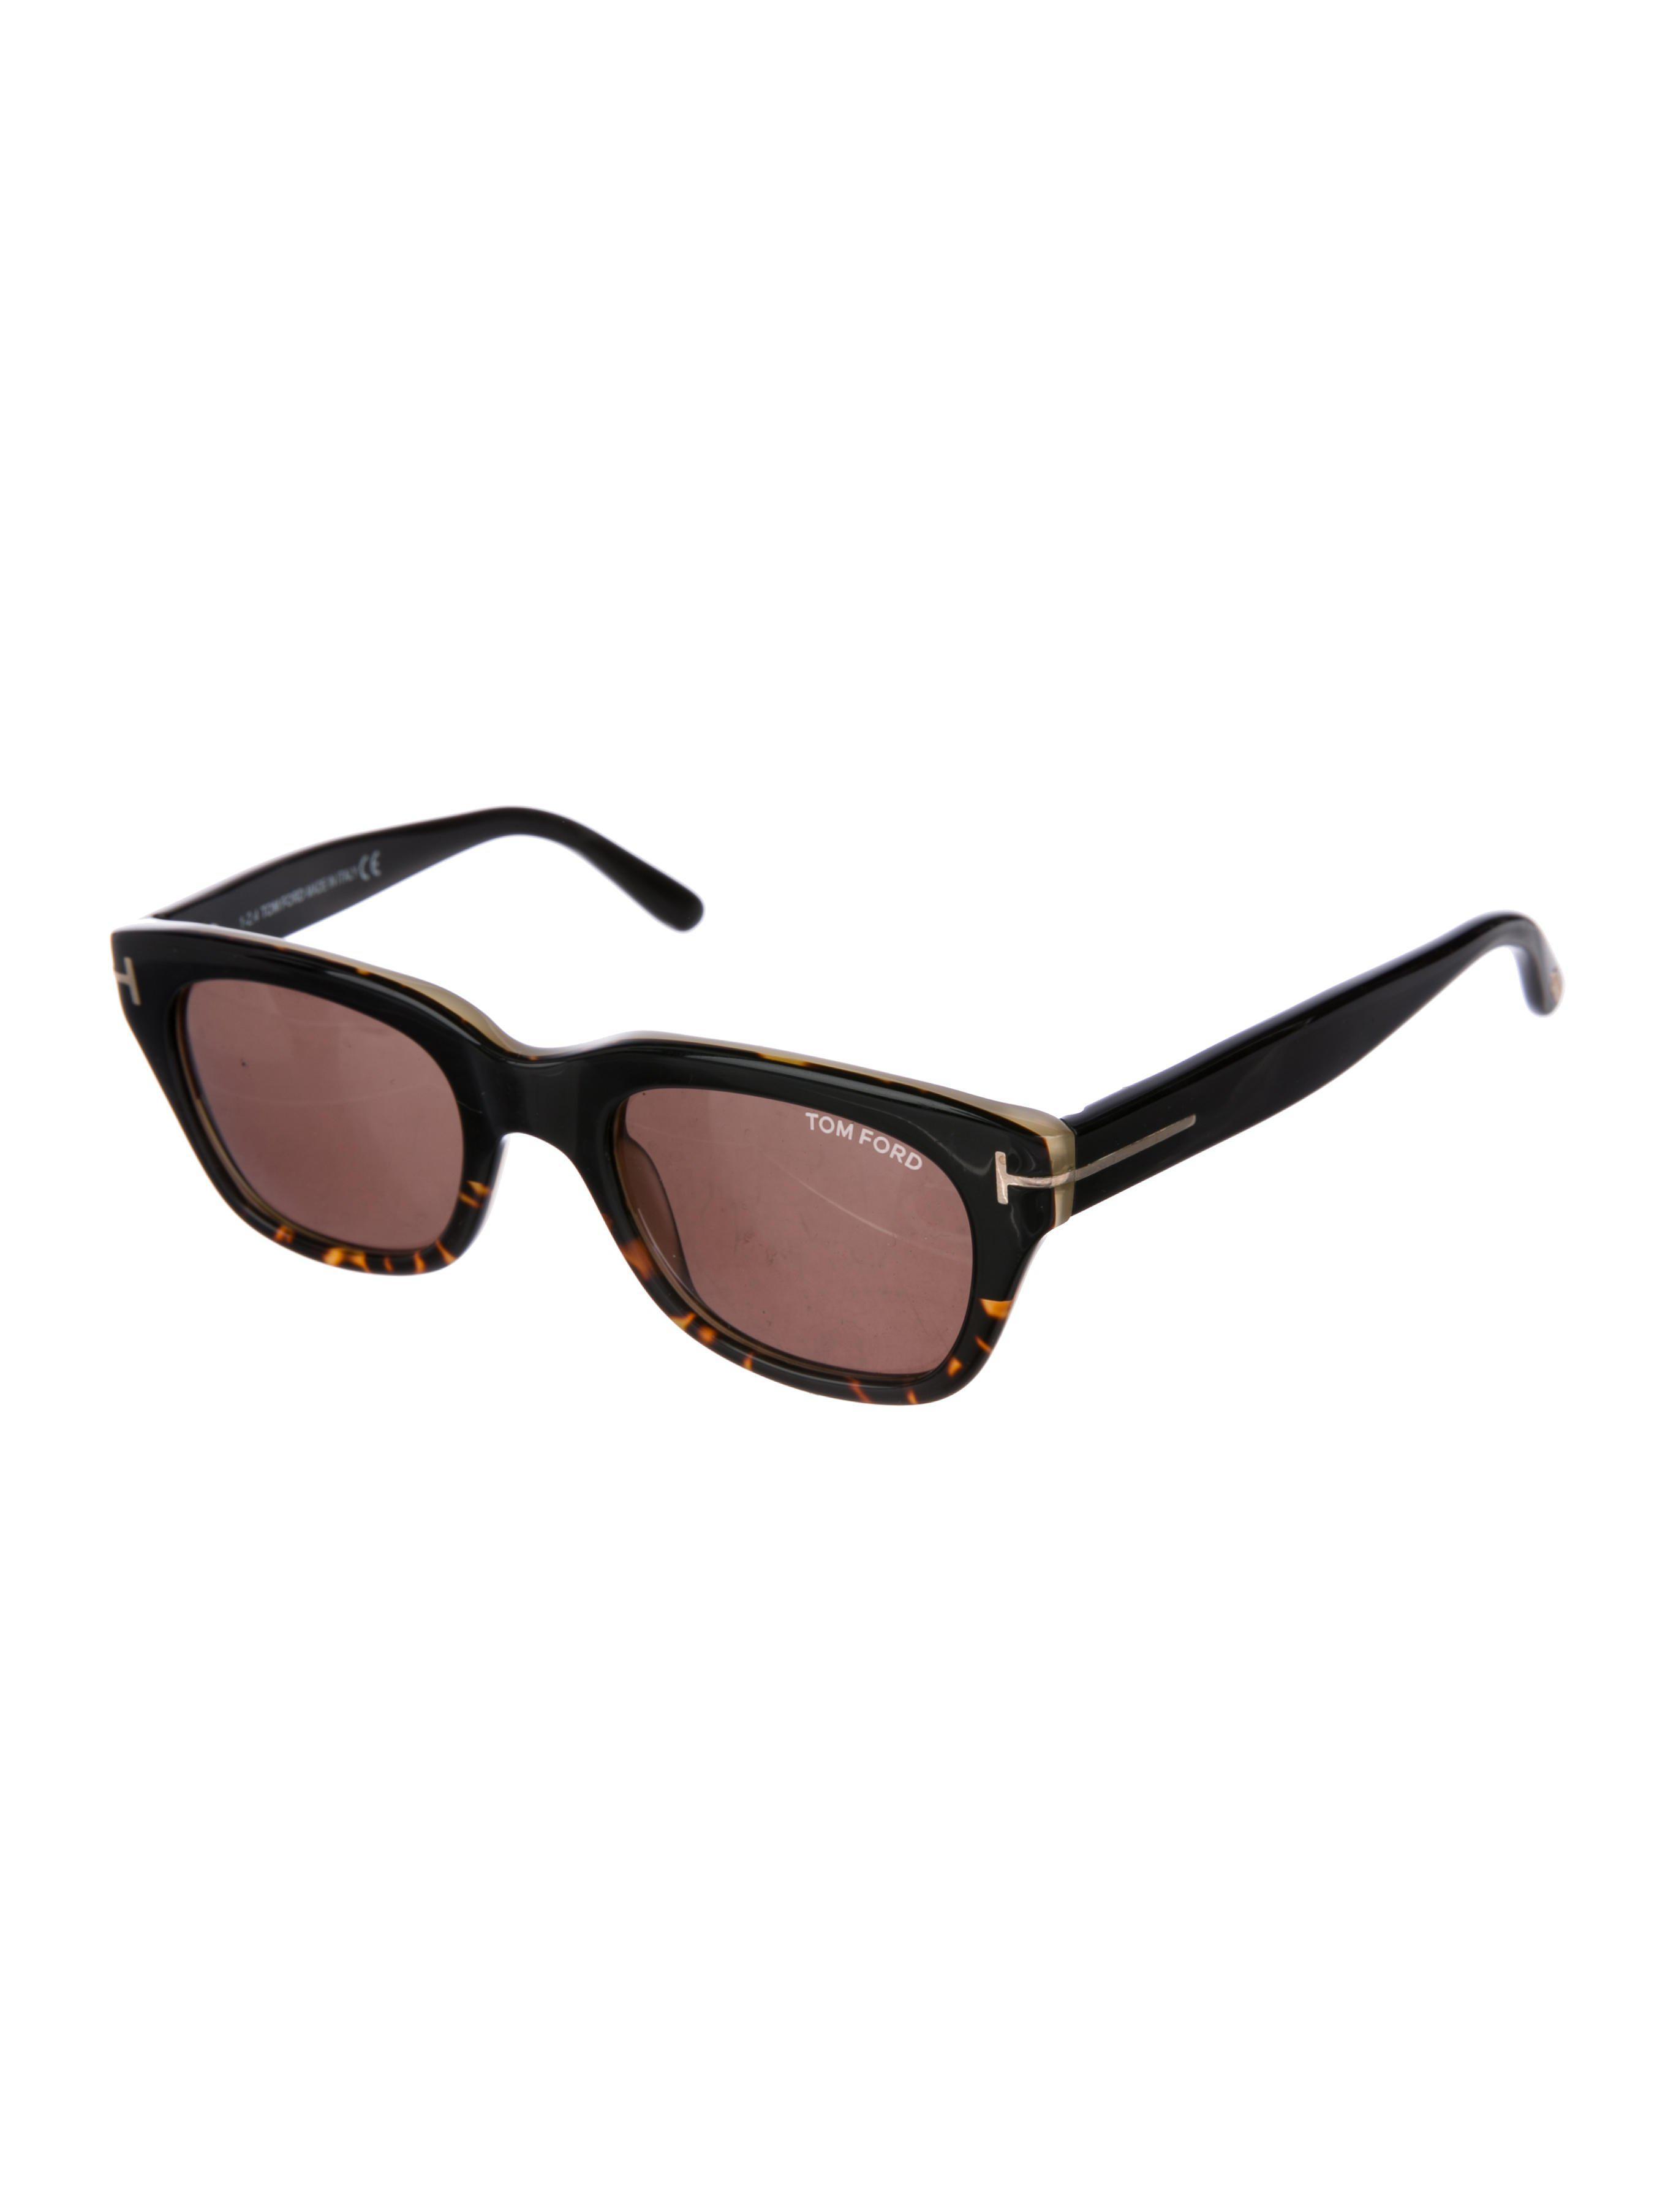 f647386843 Lyst - Tom Ford Snowdon Tortoiseshell Sunglasses Black in Metallic